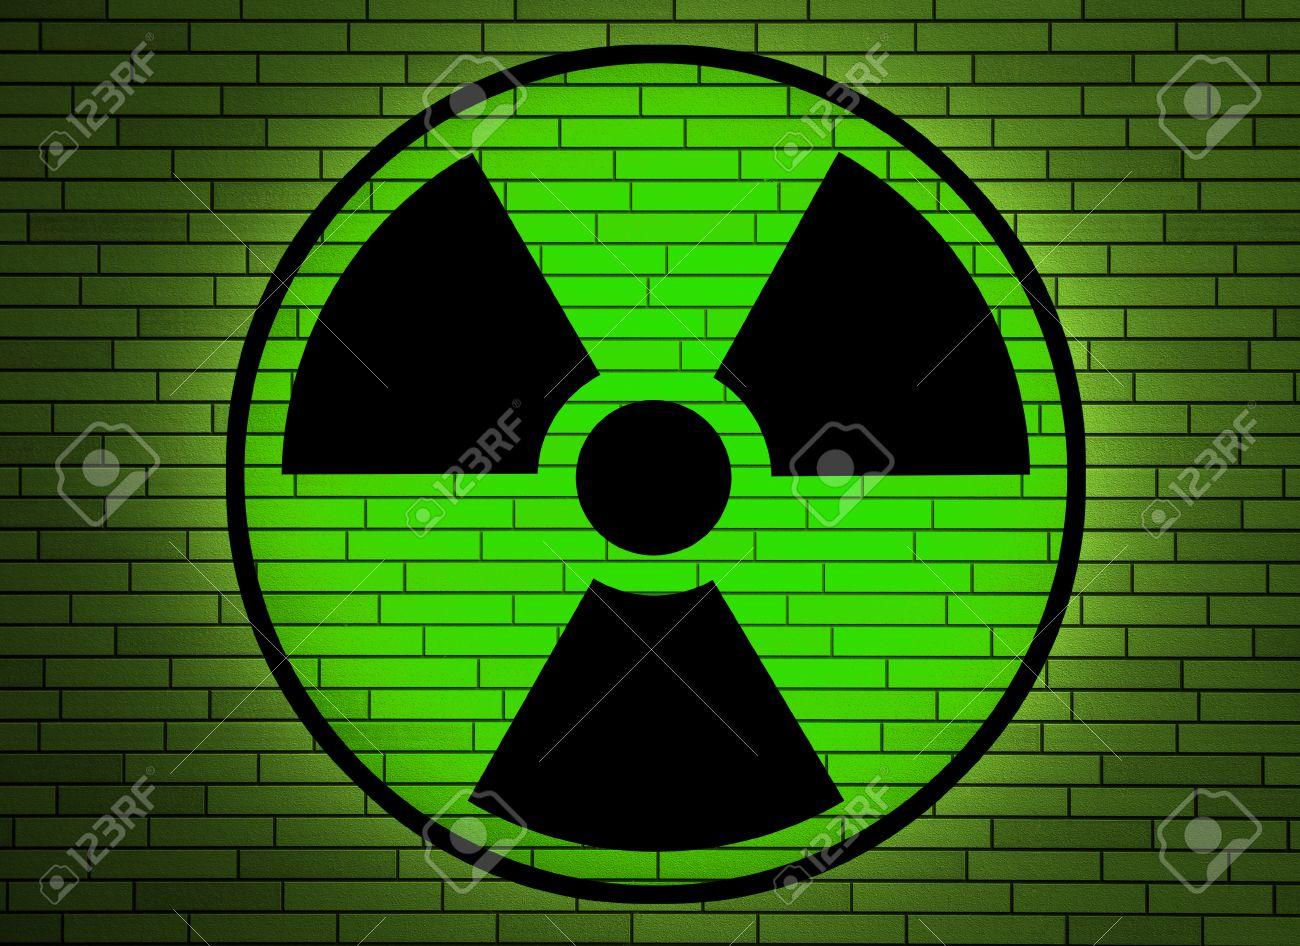 Radiation sign on a brick wall Stock Photo - 25638830